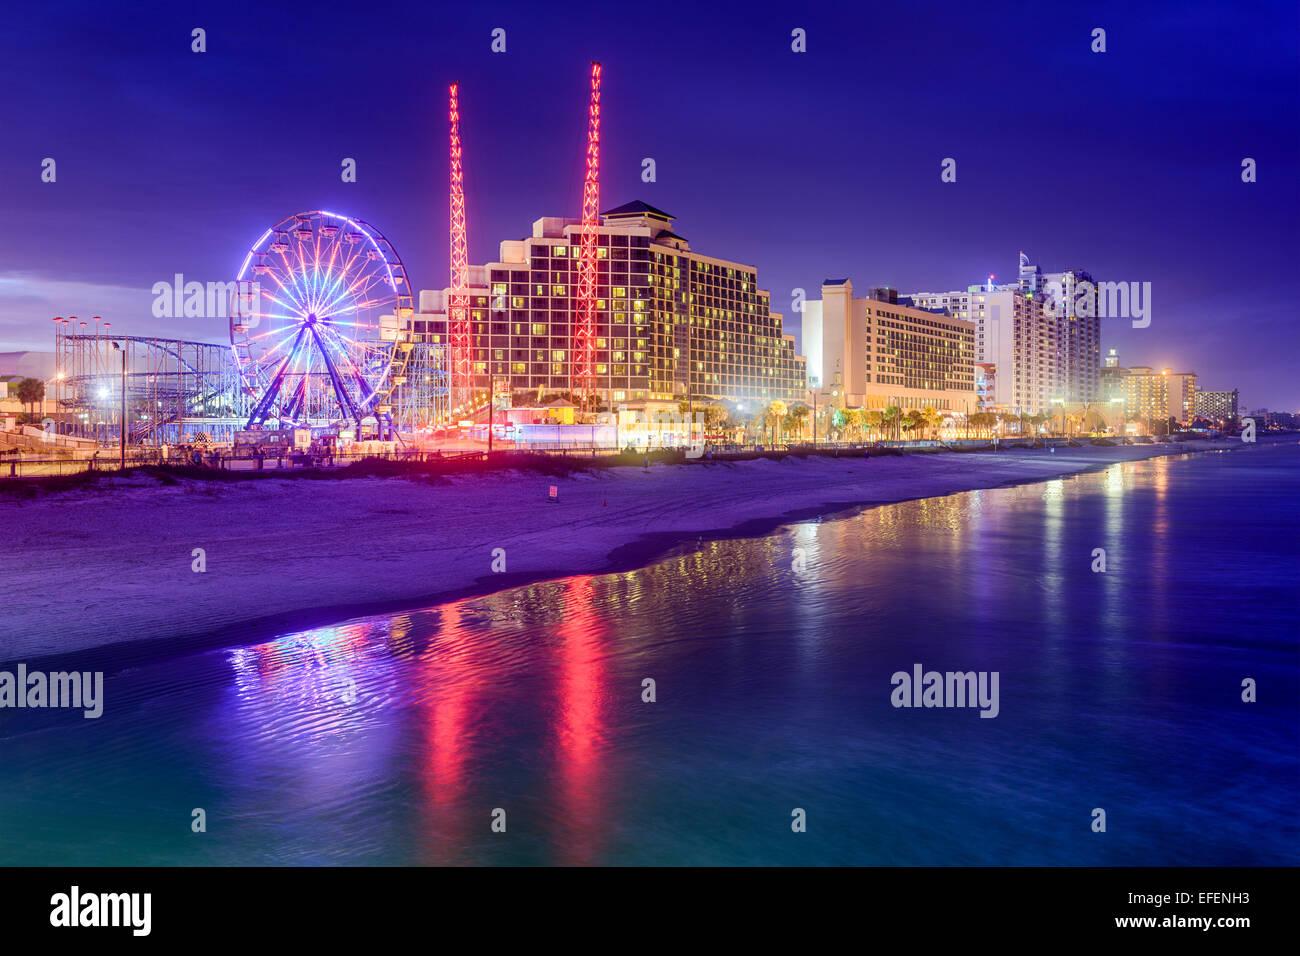 Daytona Beach Florida USA Beachfront Skyline At Night